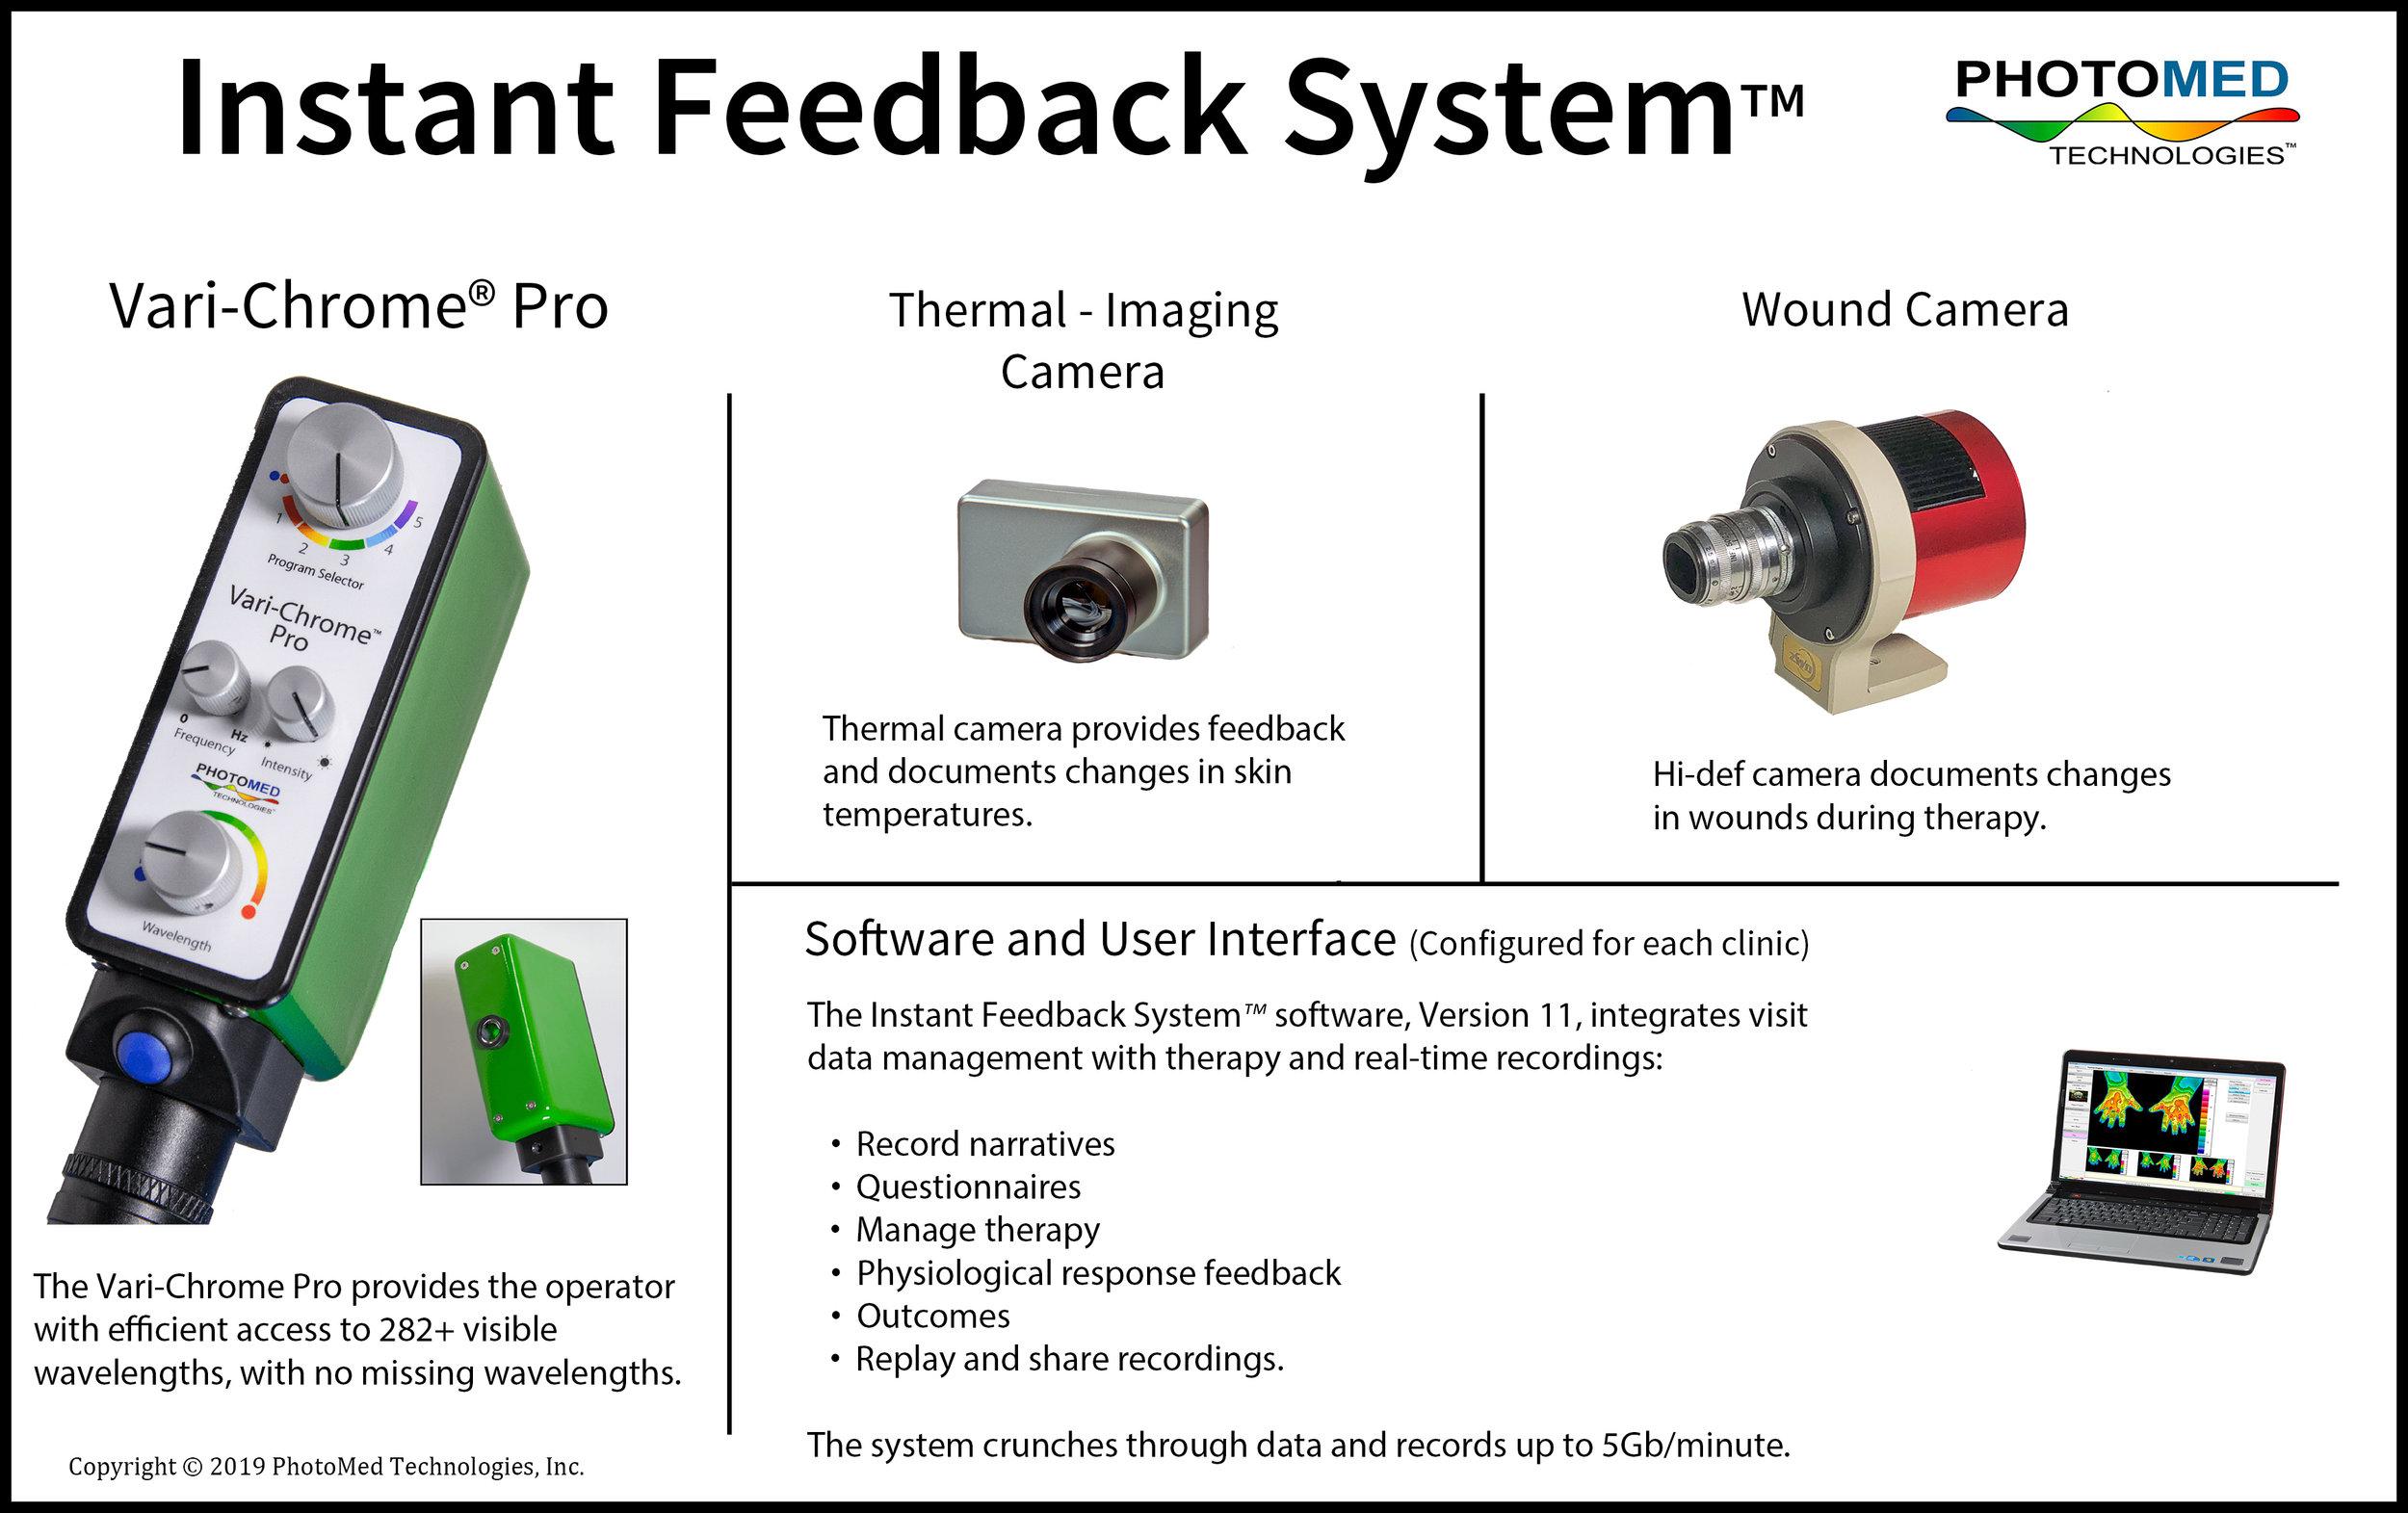 InstantFeedbackSystemBoxes2019-04-24C-3600.jpg